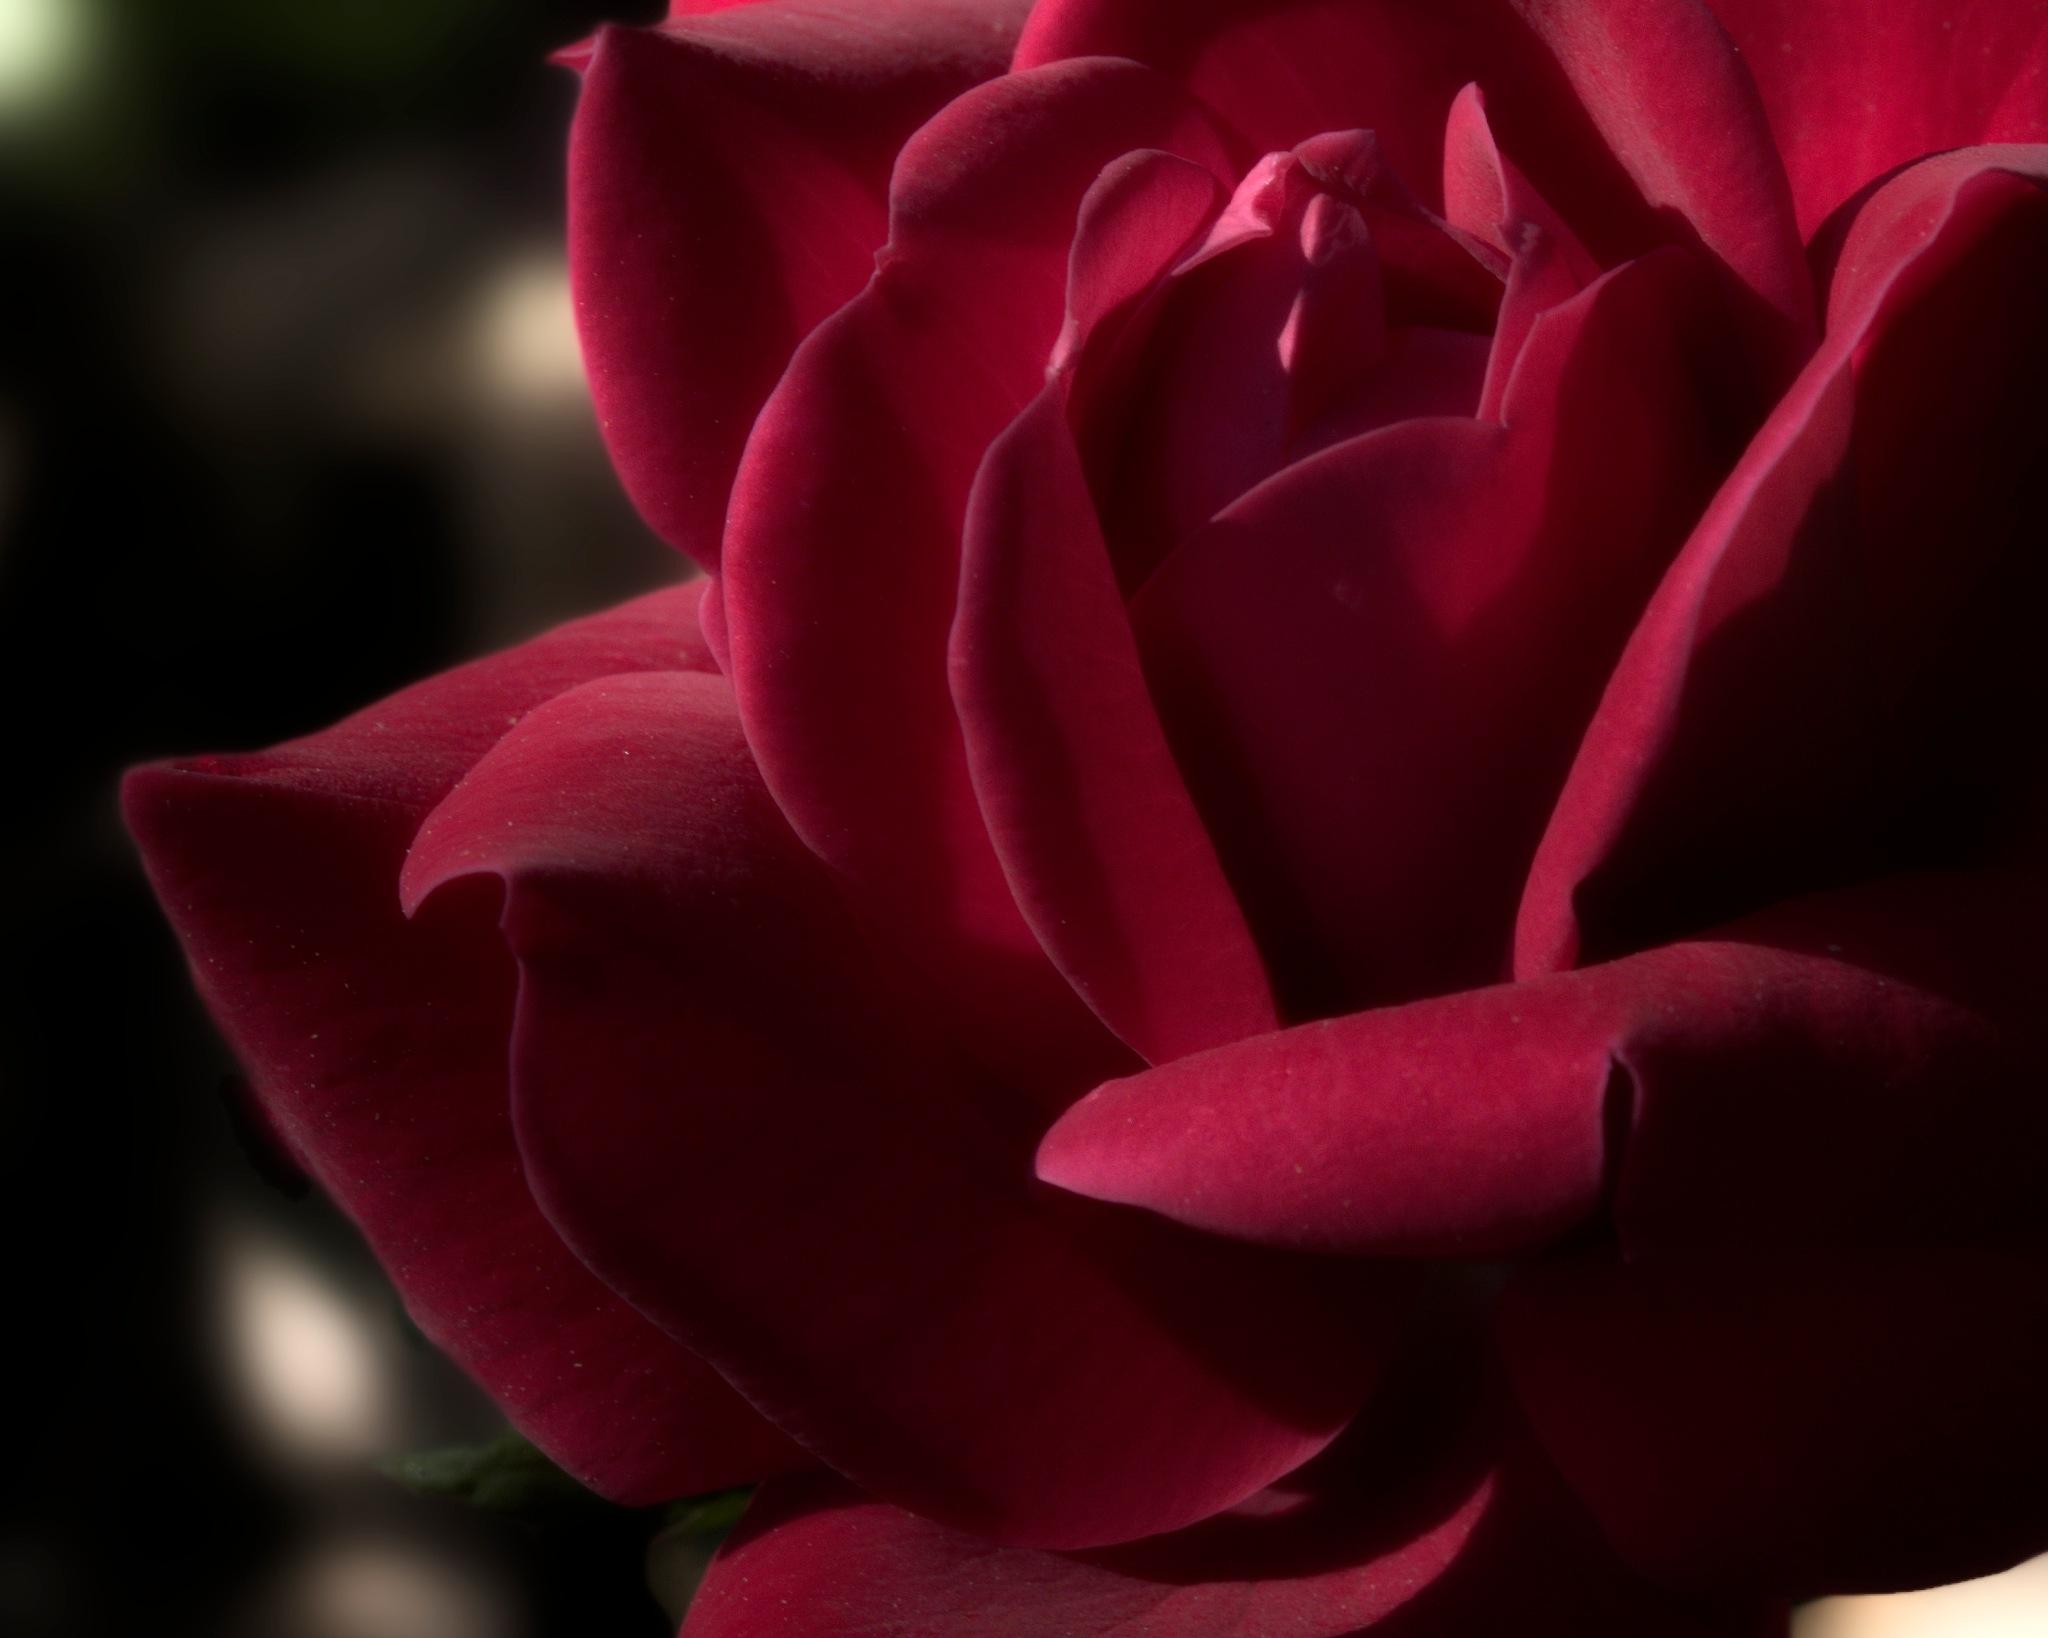 Red Velvet by David DeBord